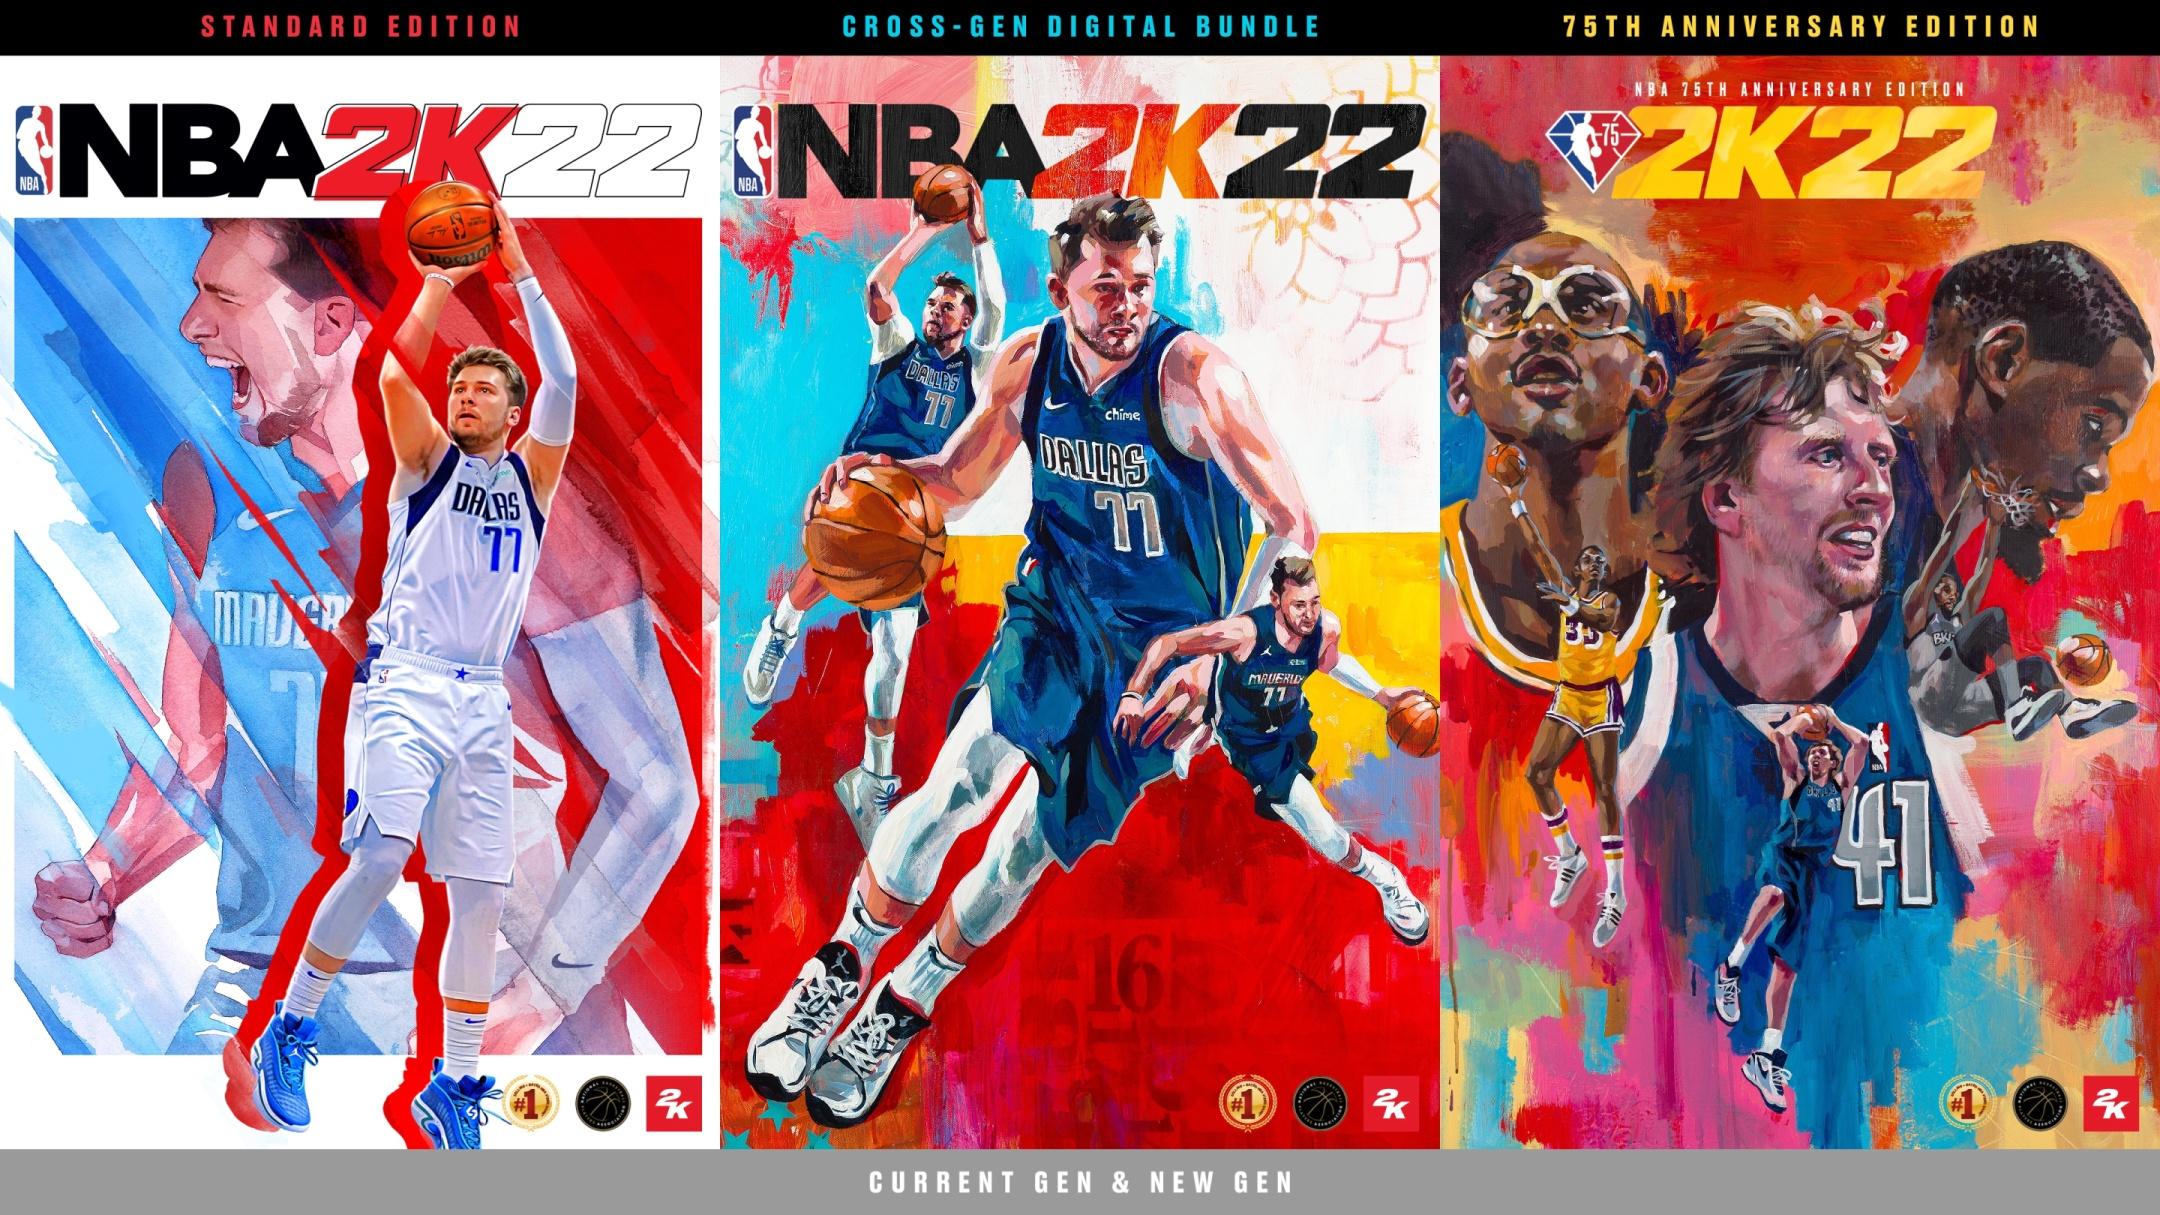 NBA 2K22 mit 75th Anniversary Edition angekündigt!